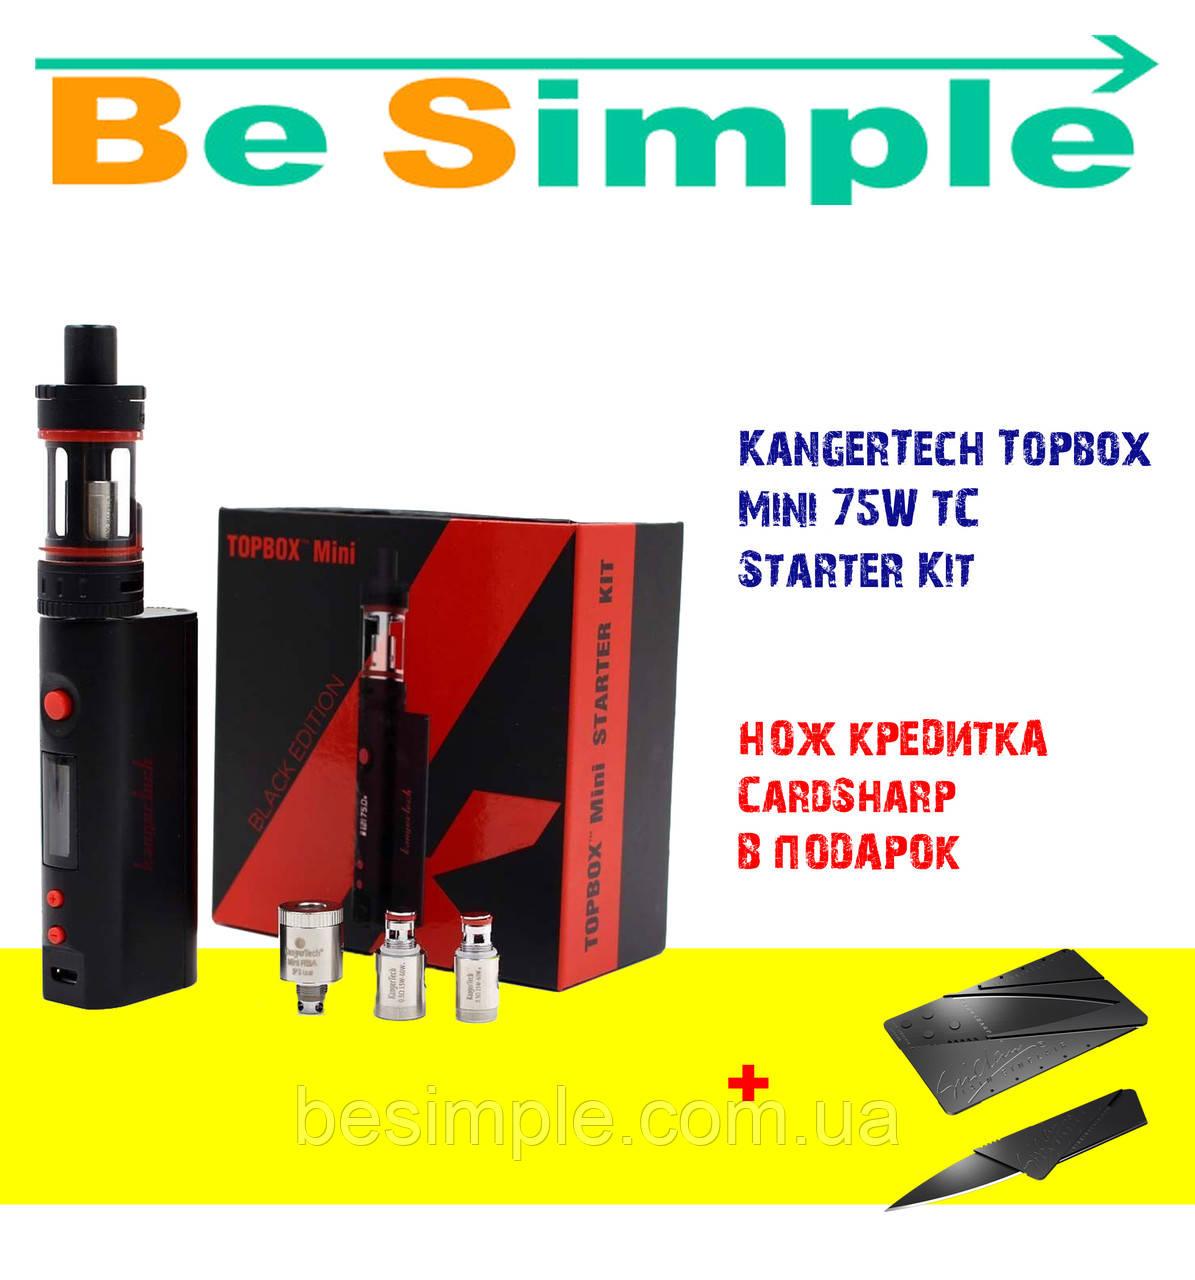 Электронная сигарета KangerTech Topbox Mini 75W TC Starter Kit (Quality Replica)